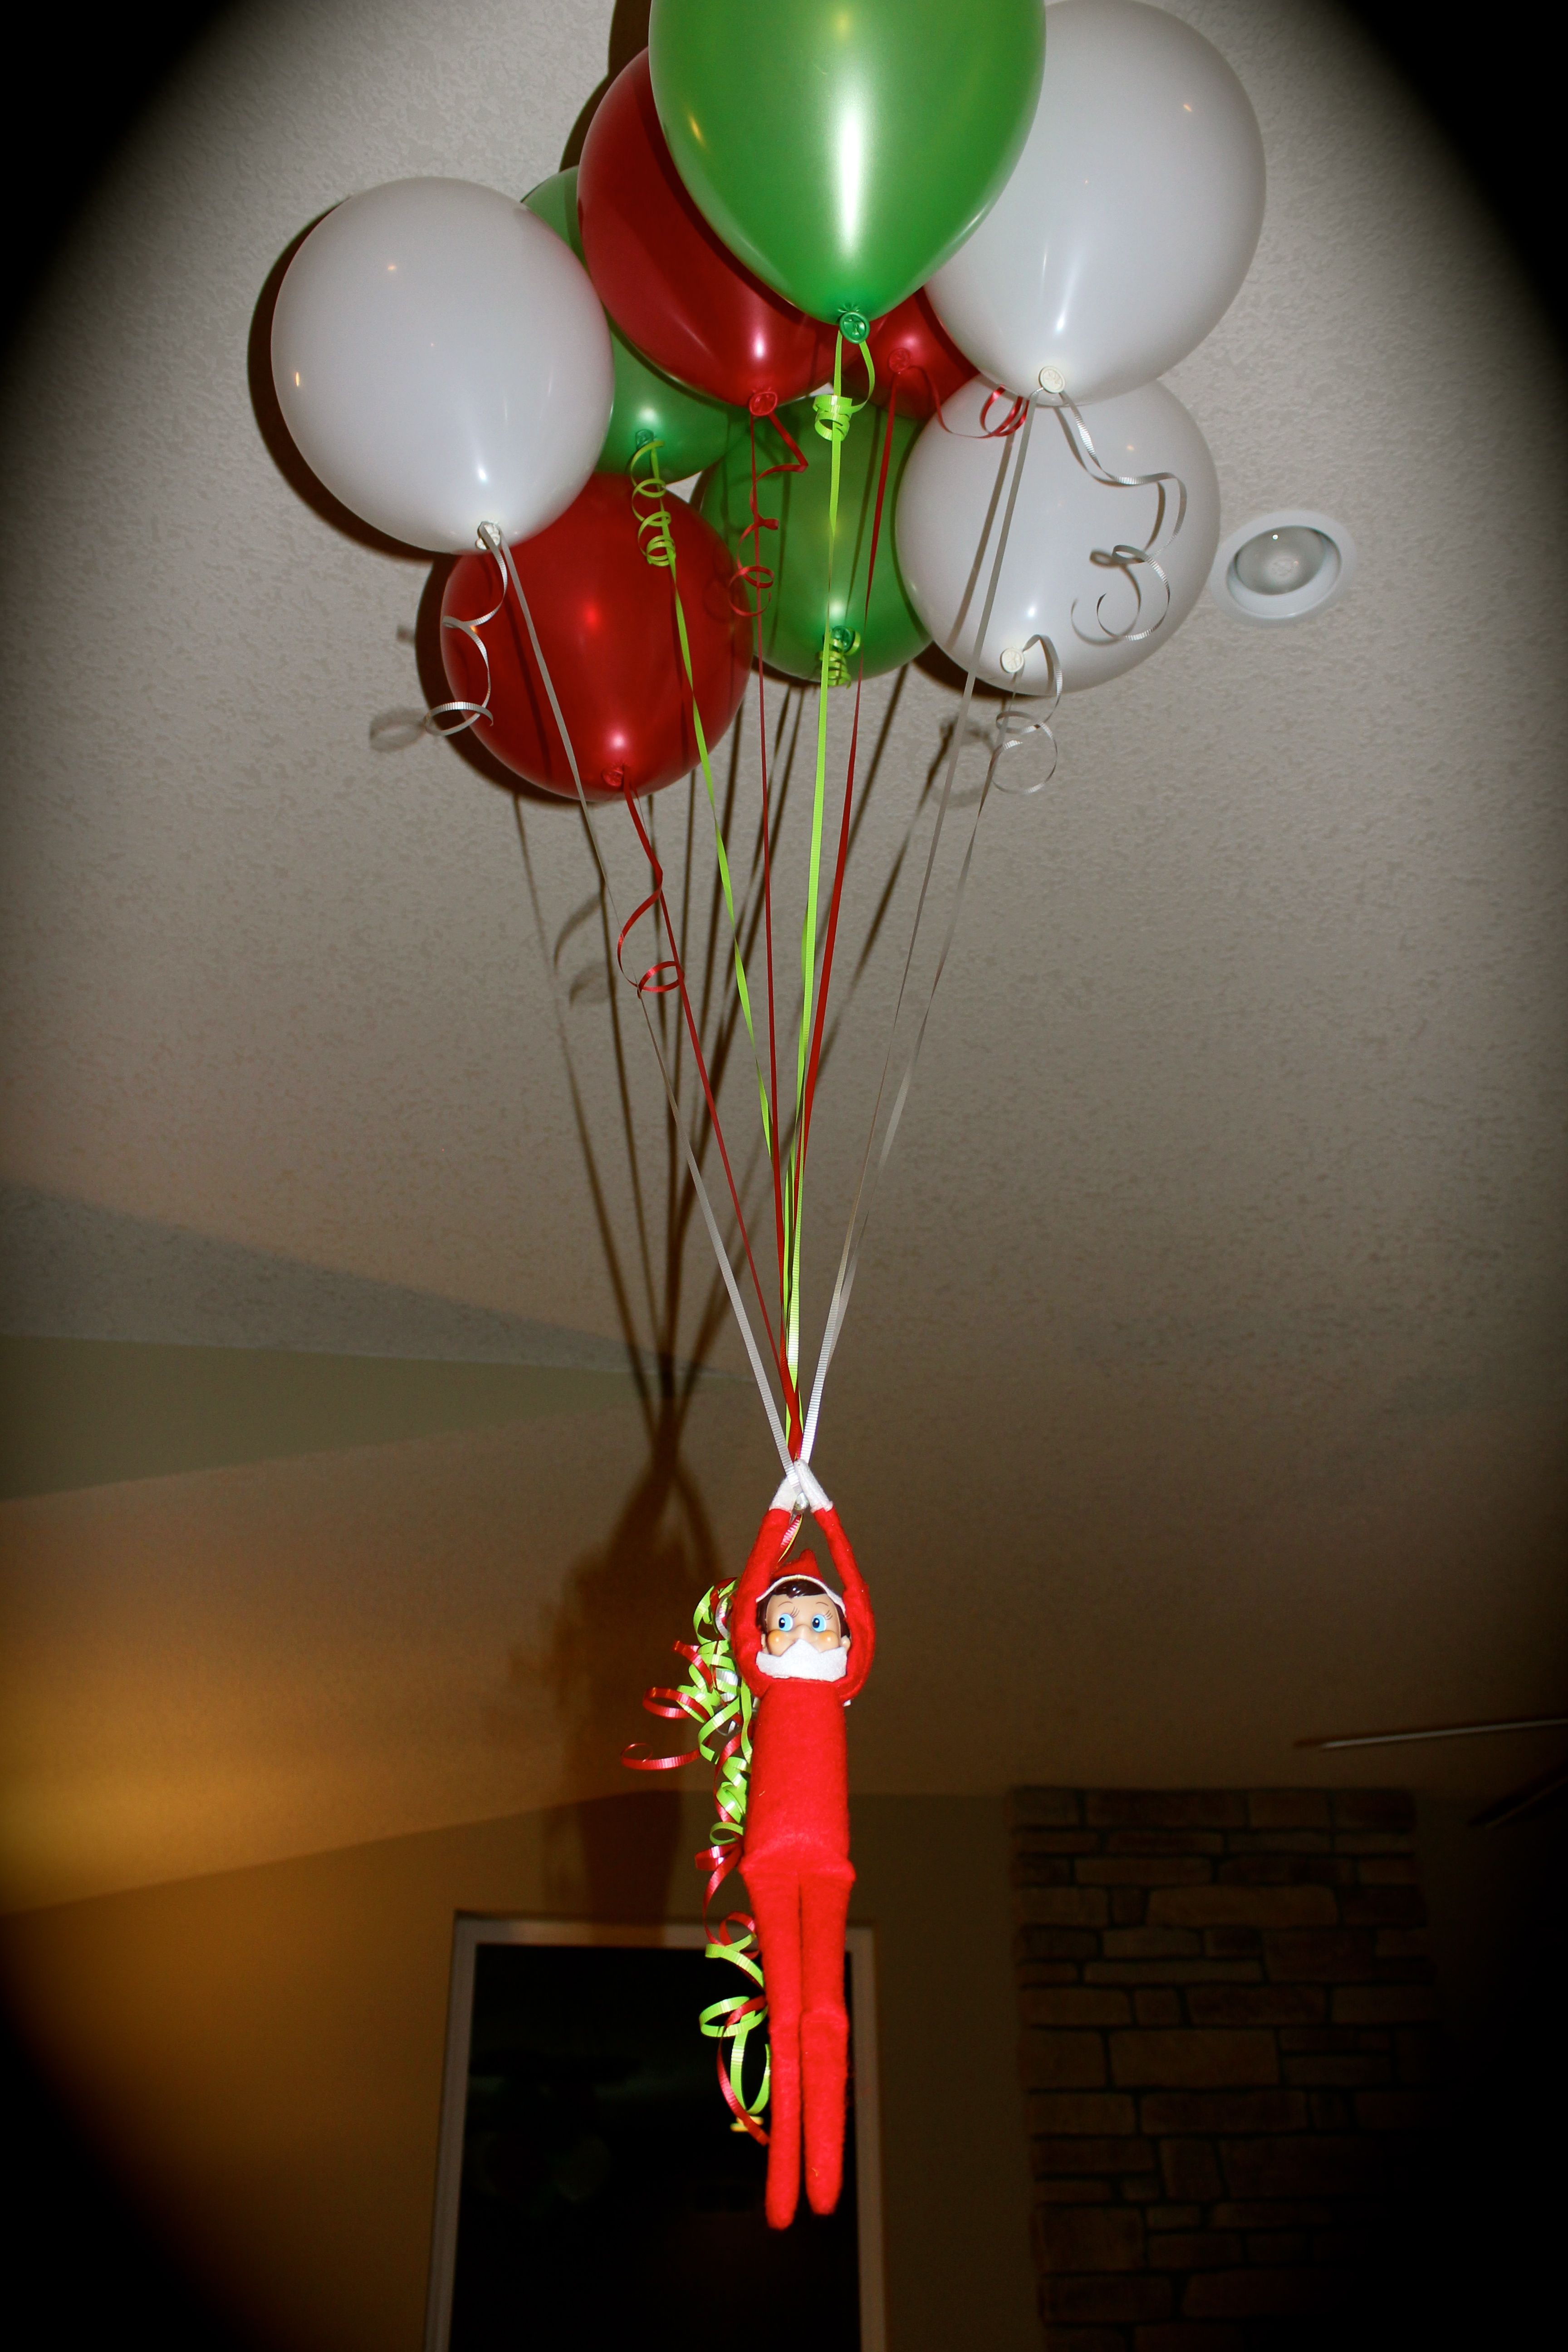 The Elf on the Shelf Ballons Foil Balloon